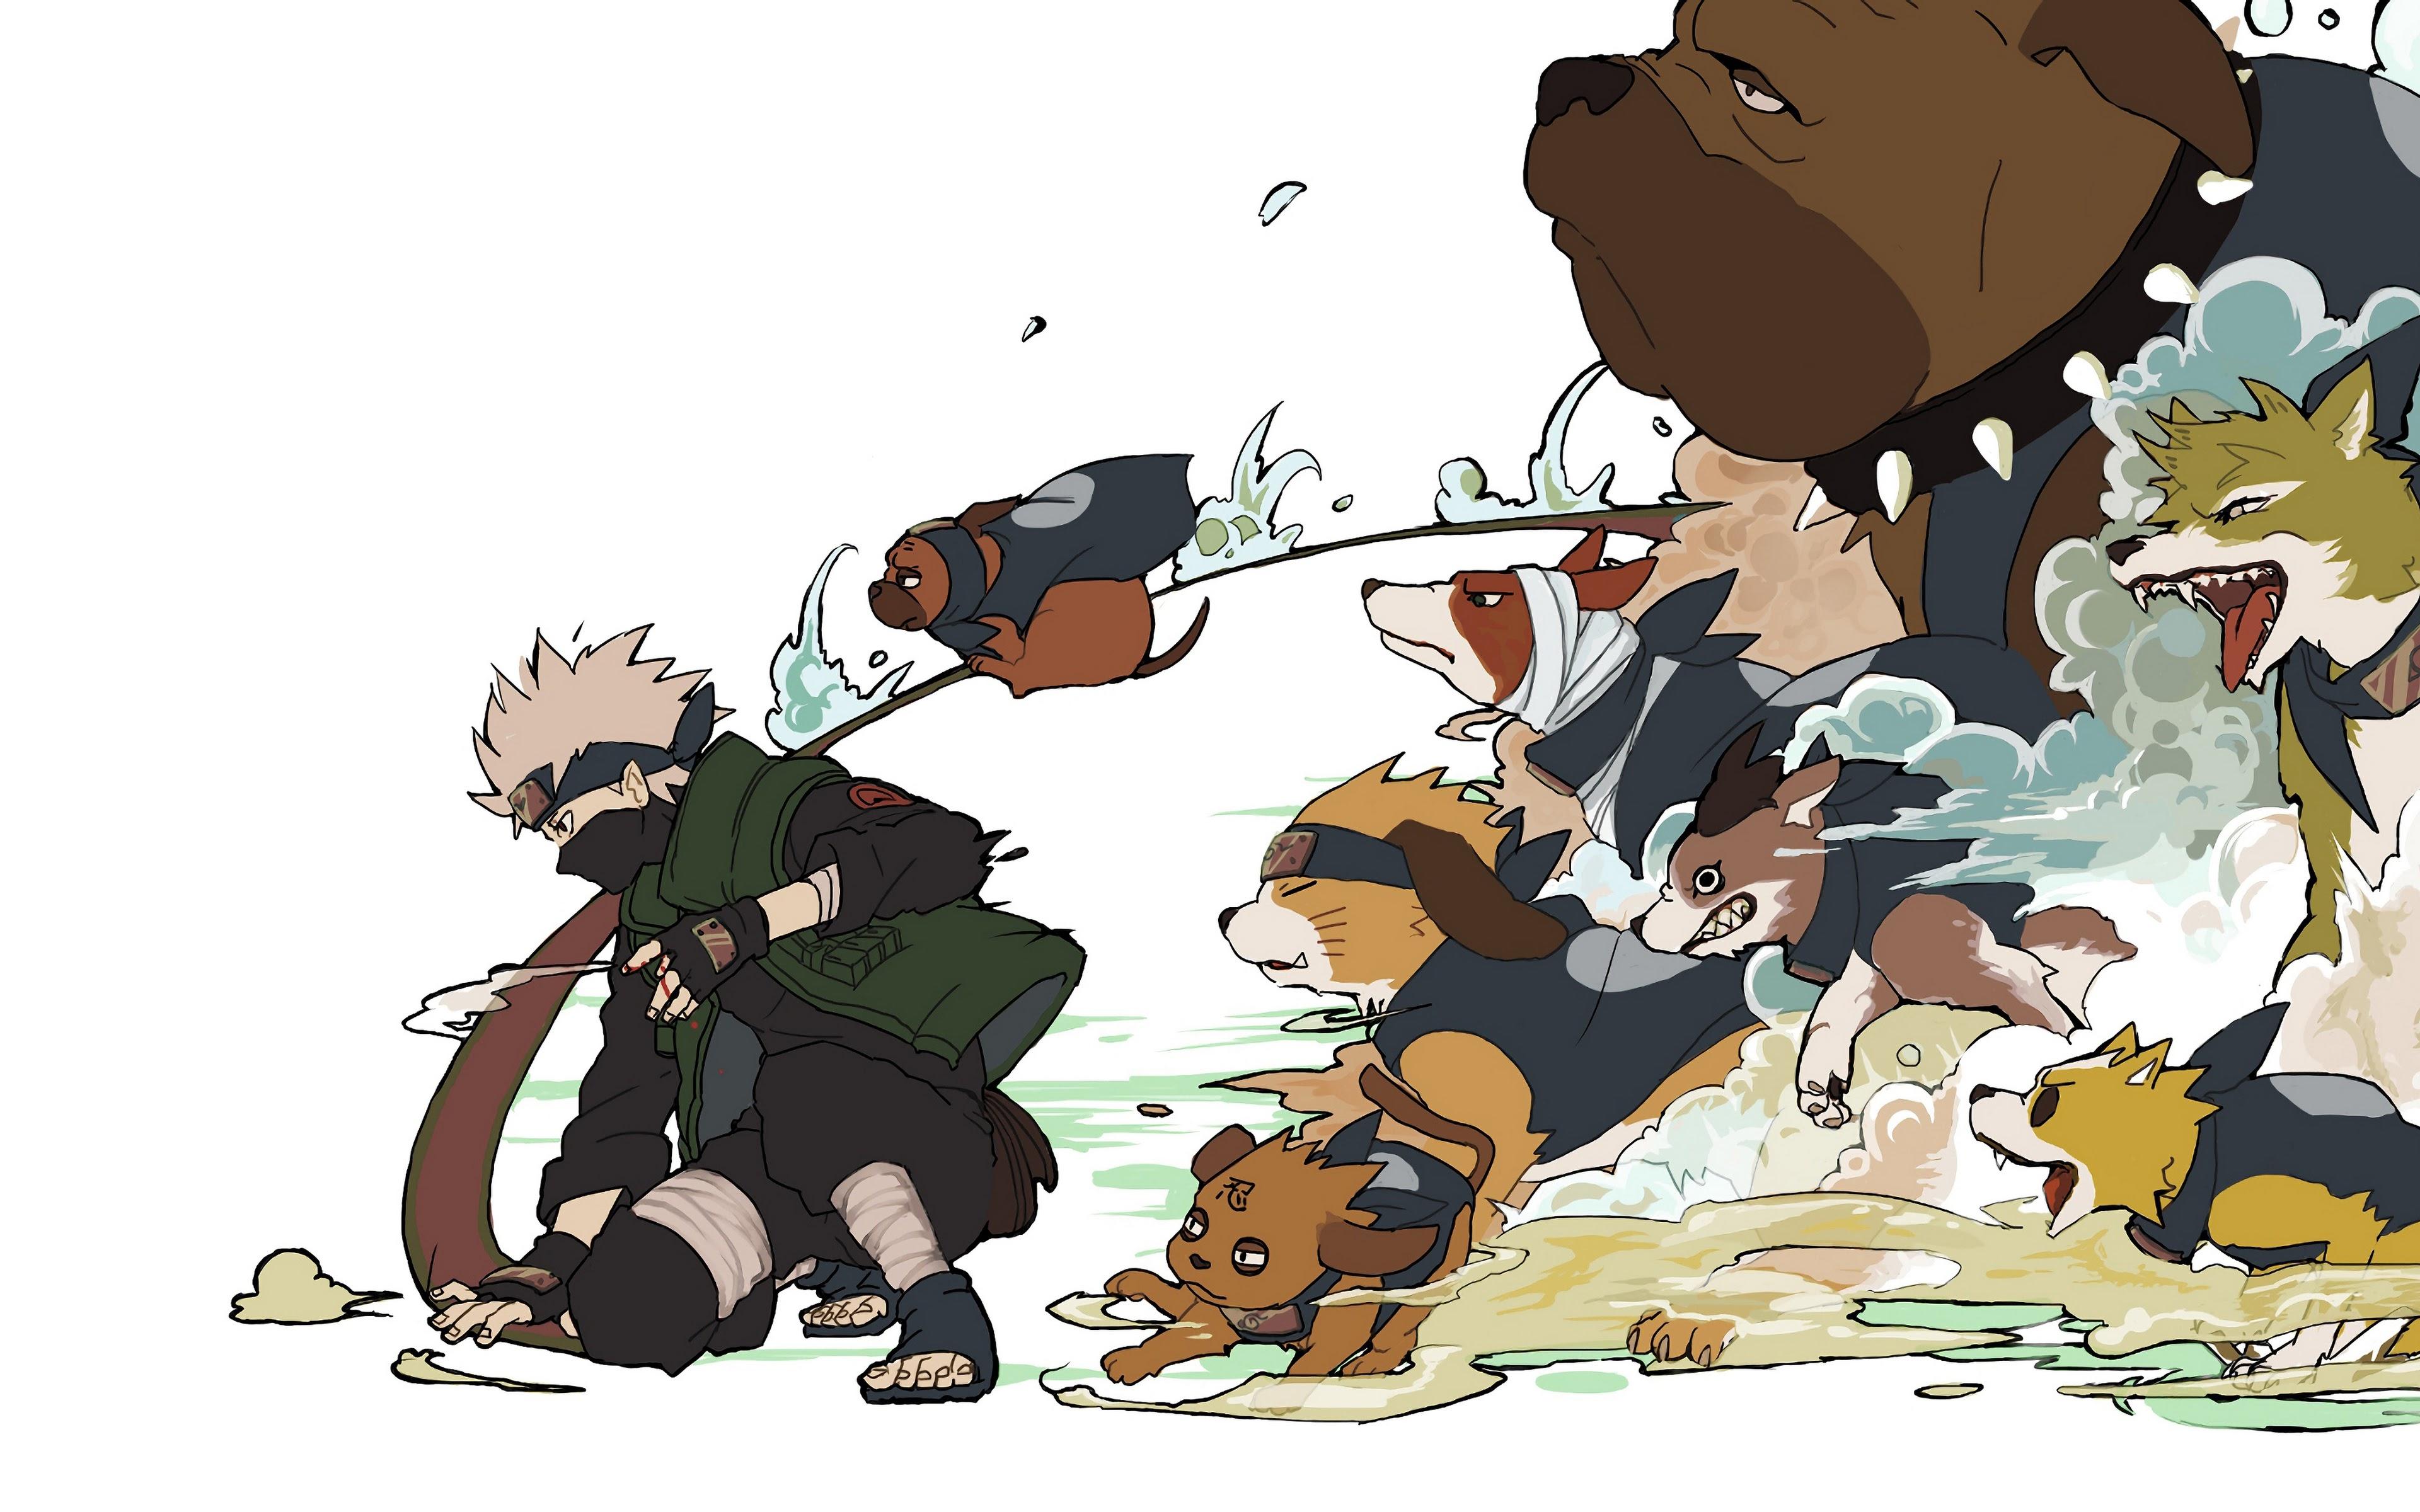 kakashi dogs summon uhdpaper.com 4K 21